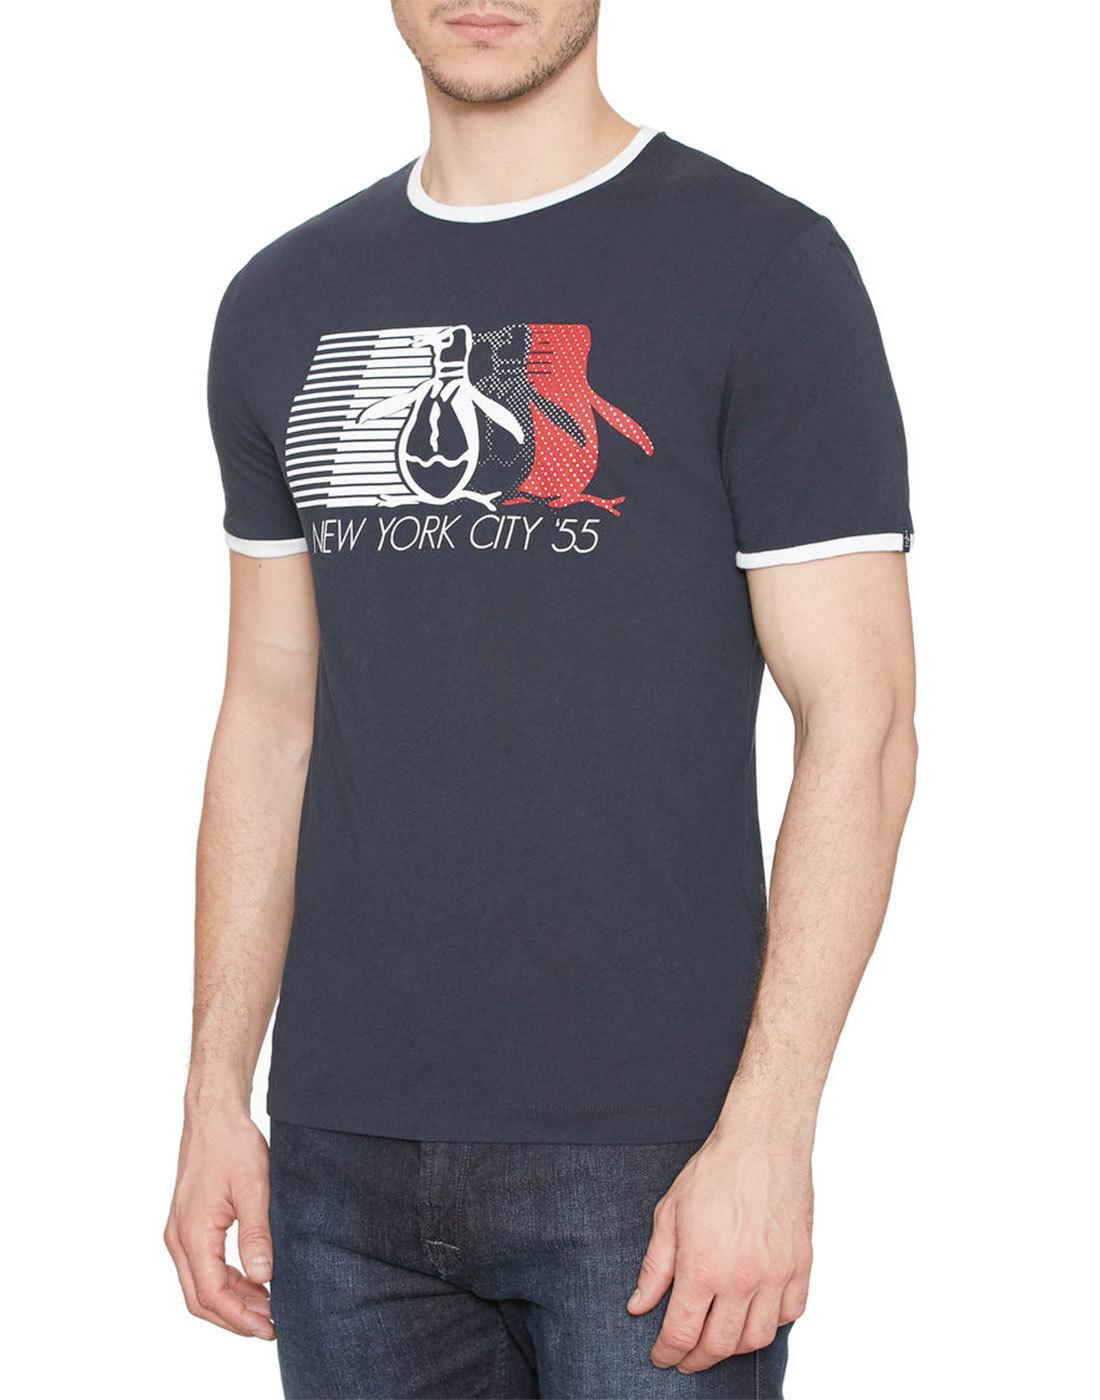 ORIGINAL PENGUIN Men's Retro 70s NYC T-Shirt Navy